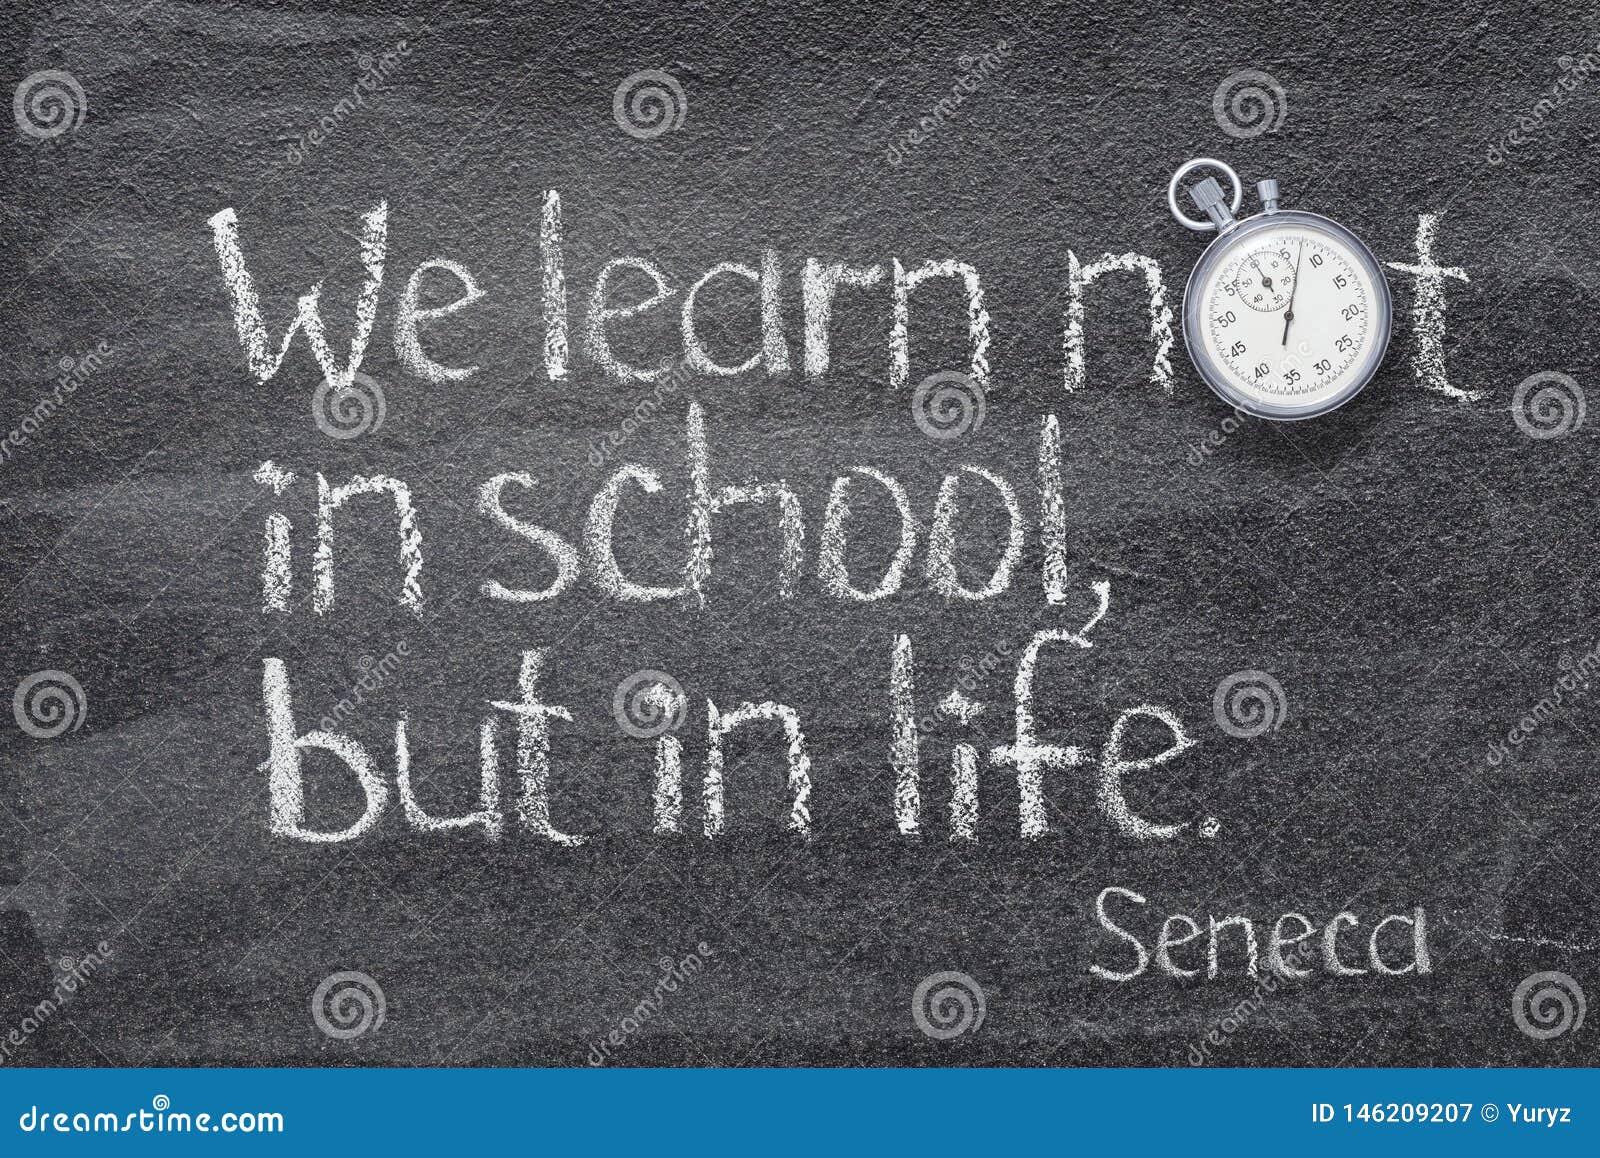 We learn Seneca